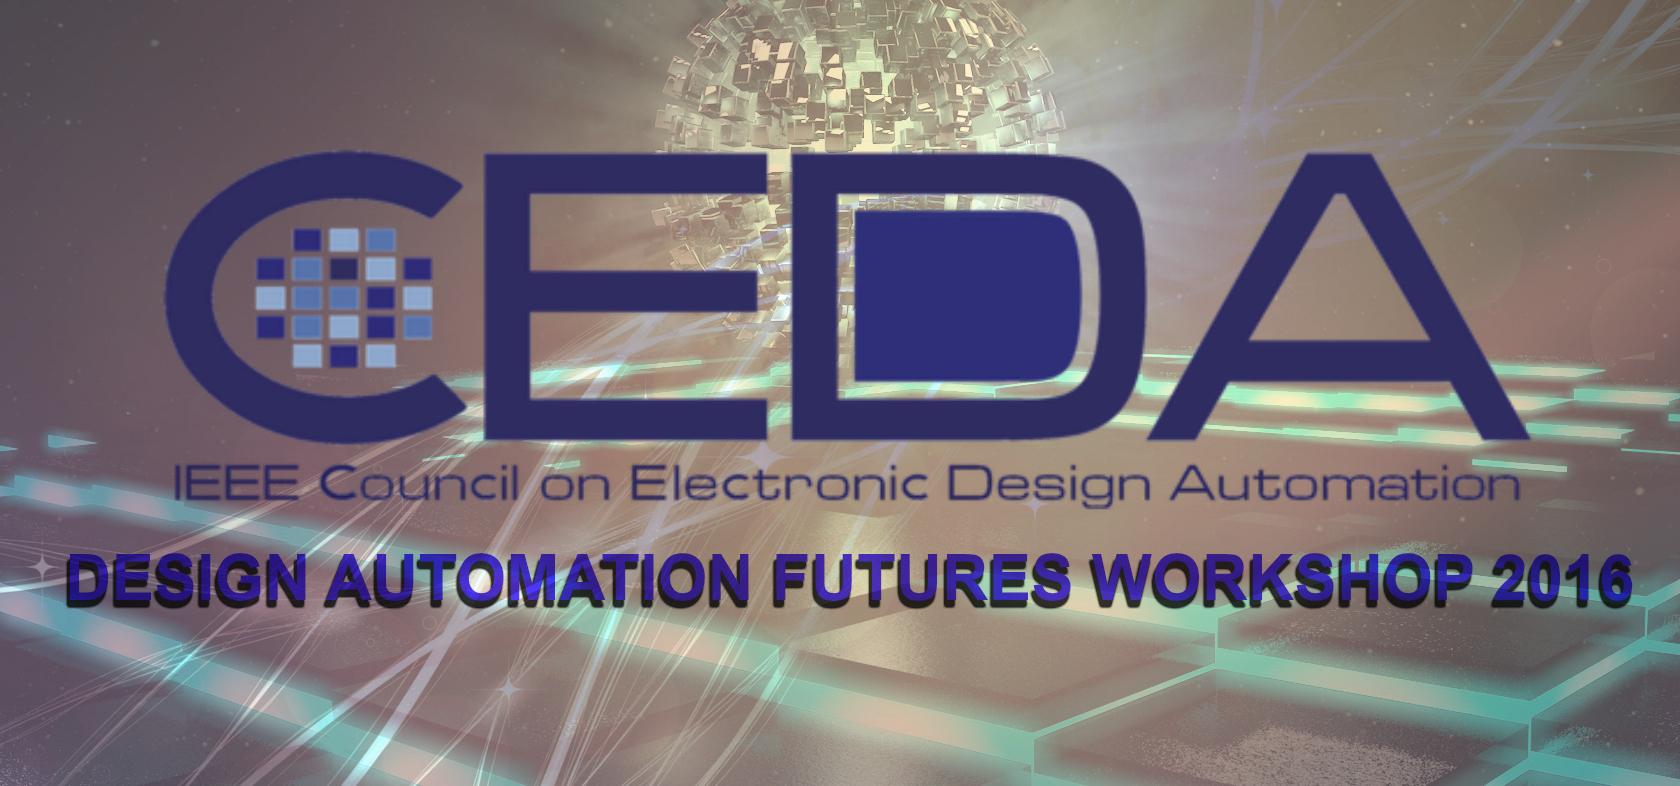 Design Automation Futures Workshop